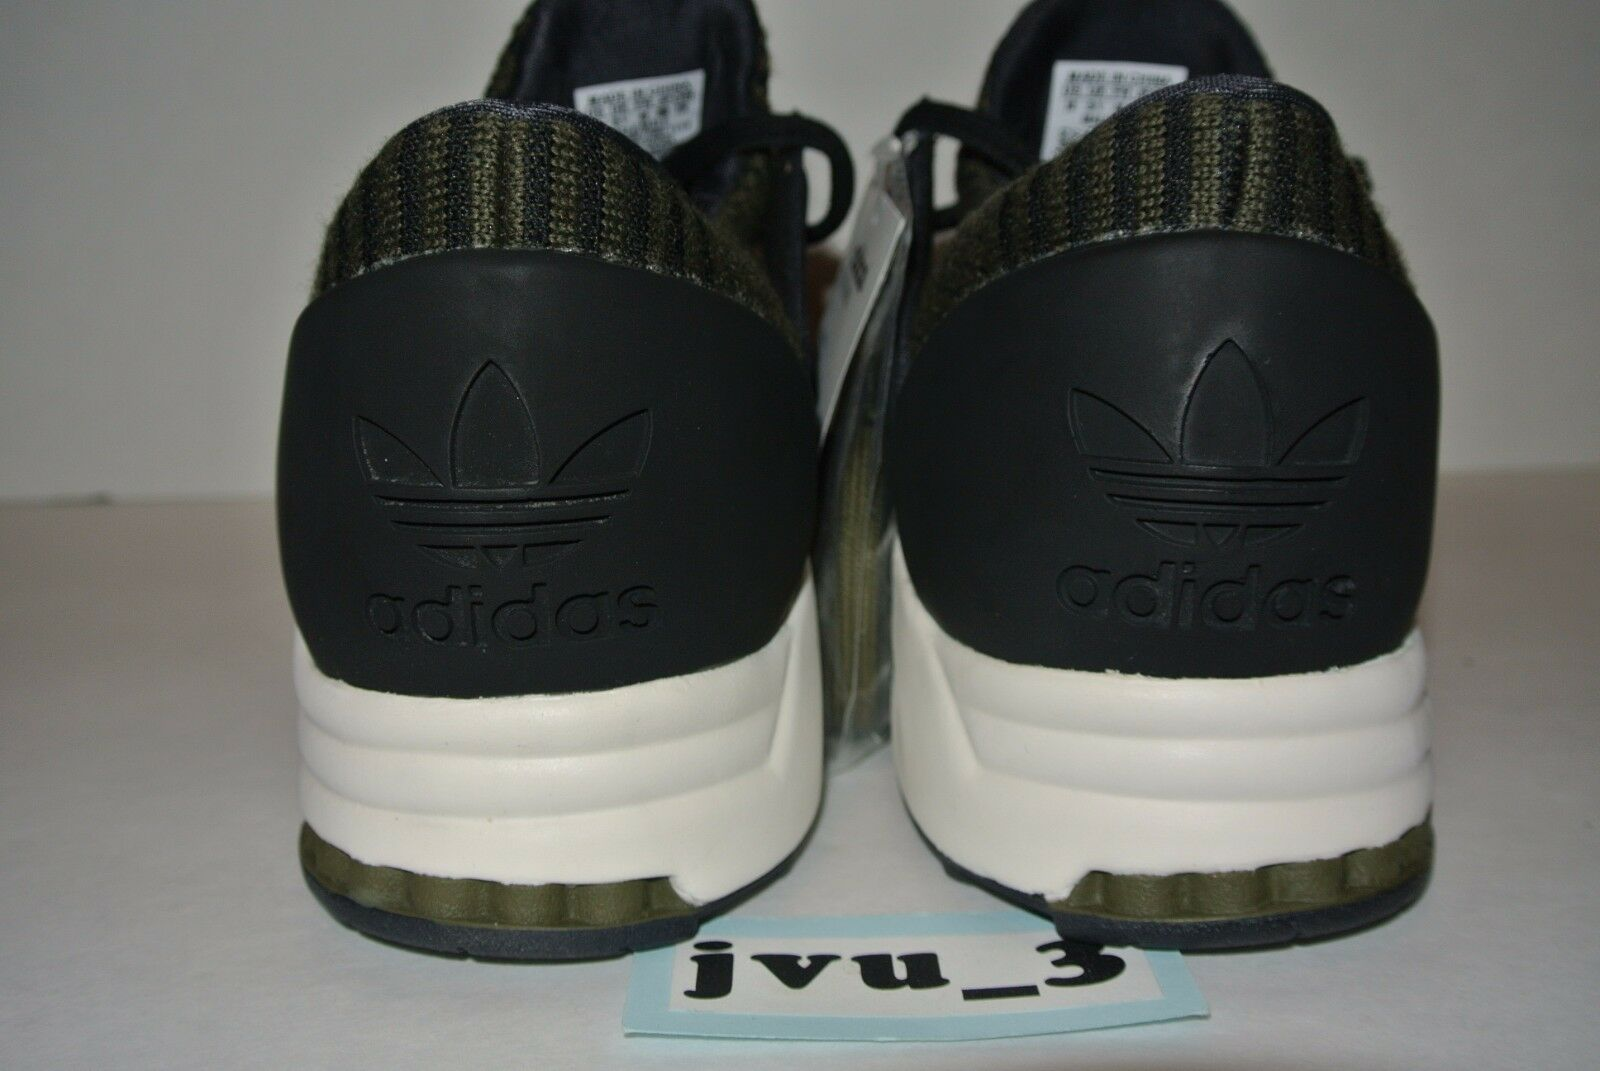 reputable site 60d61 4f727 DS adidas EQT 13 F15 Athleisure Sz 10 Dust Green Aq5264 Equipment Y-3  Black for sale online  eBay